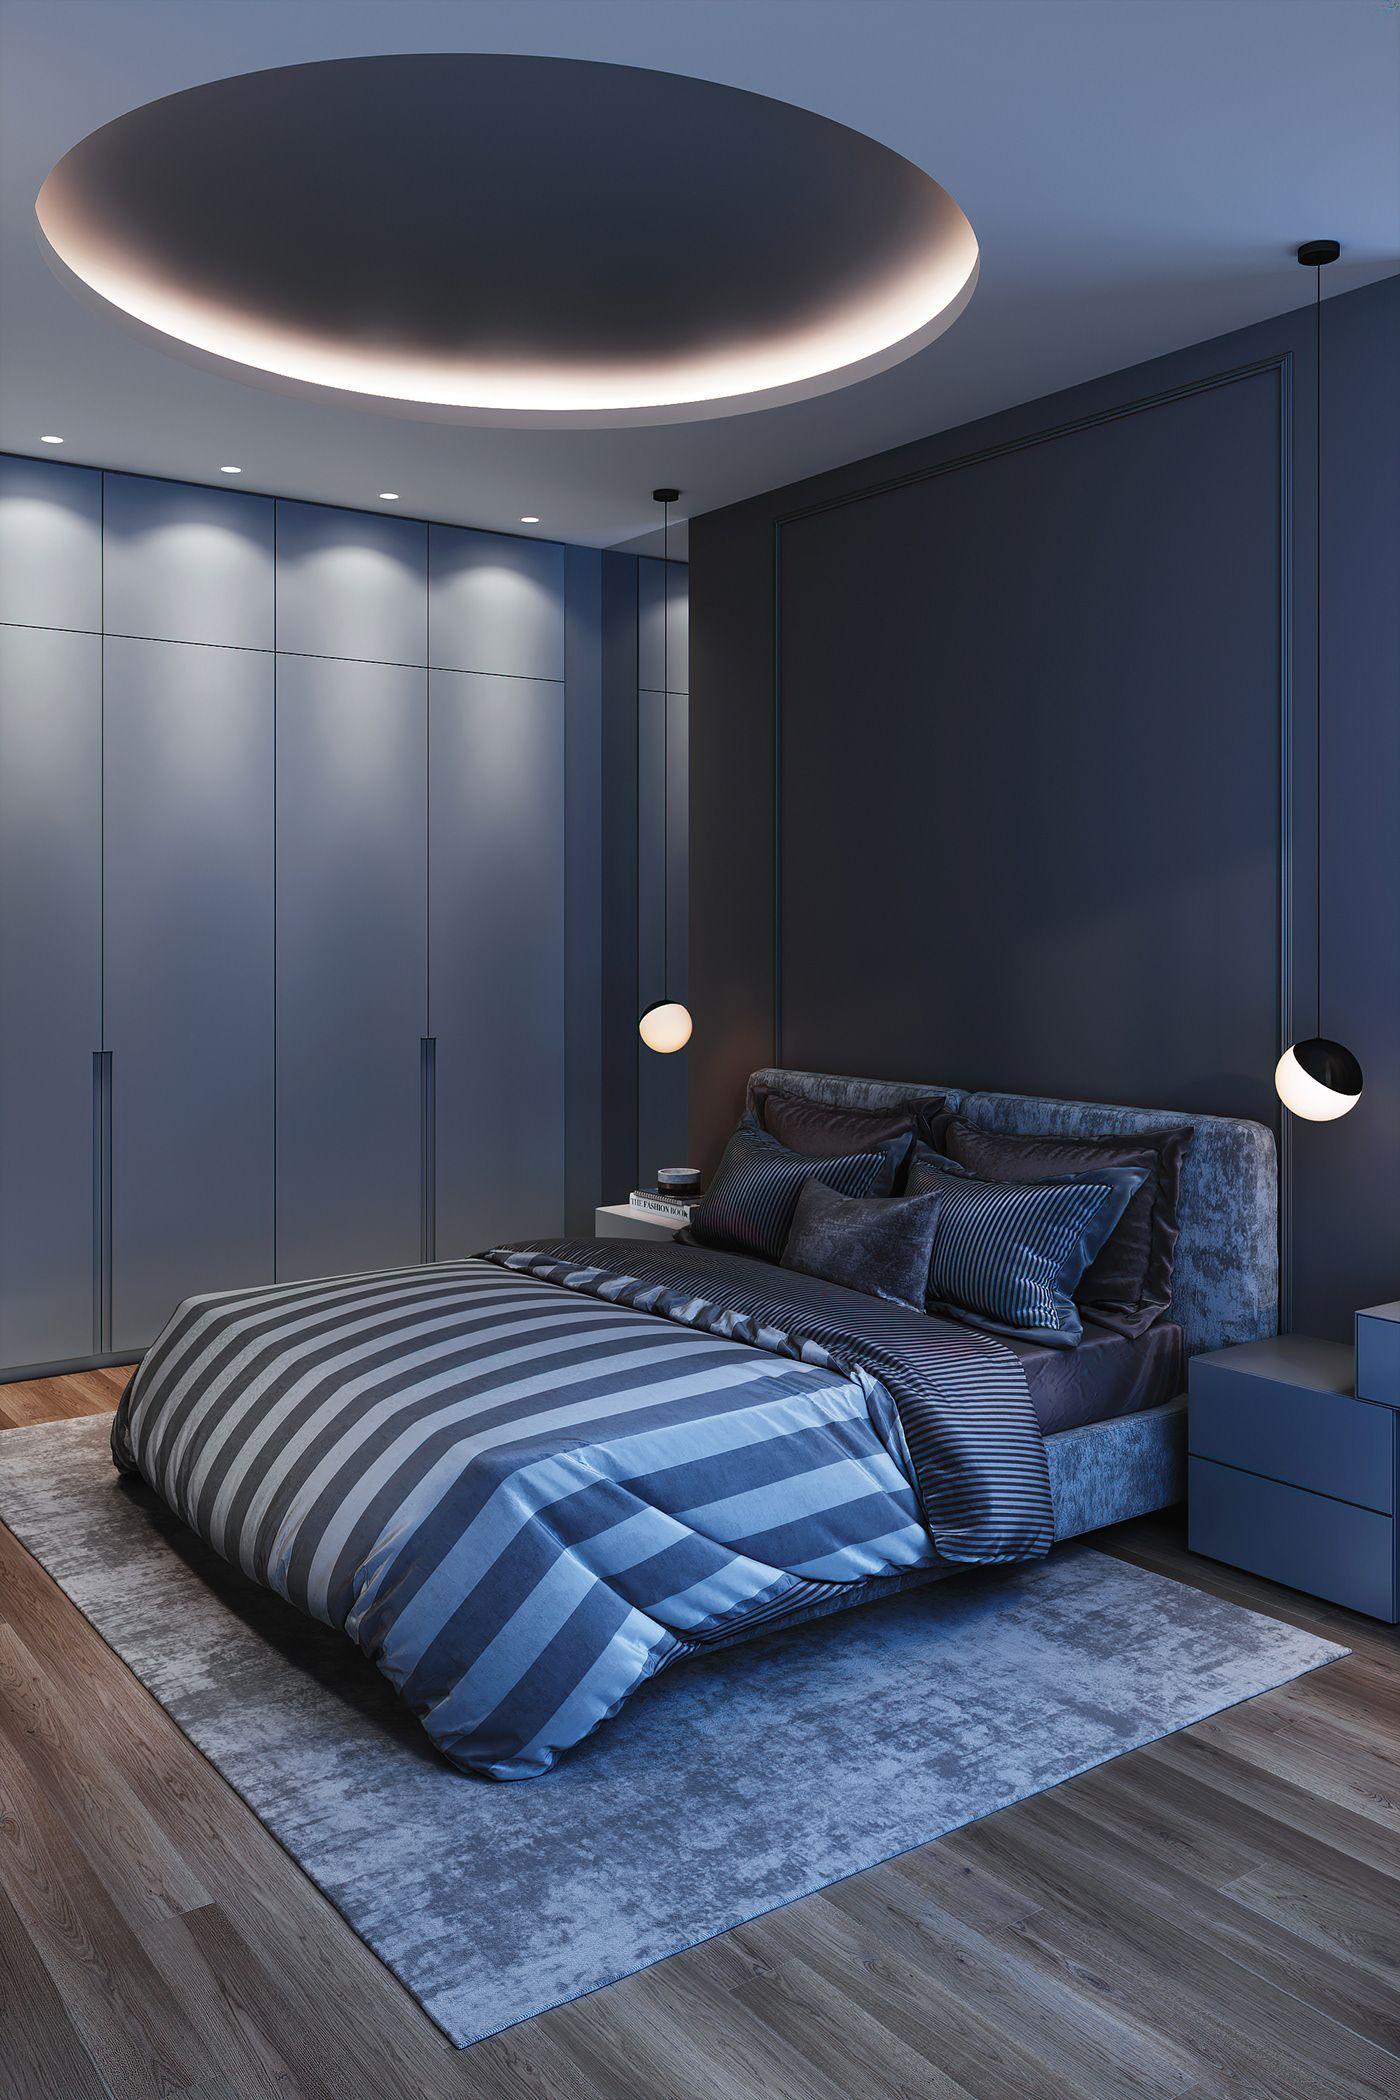 M A S T E R B E D R O O M On Behance Bedroom False Ceiling Design Ceiling Design Bedroom Modern Luxury Bedroom